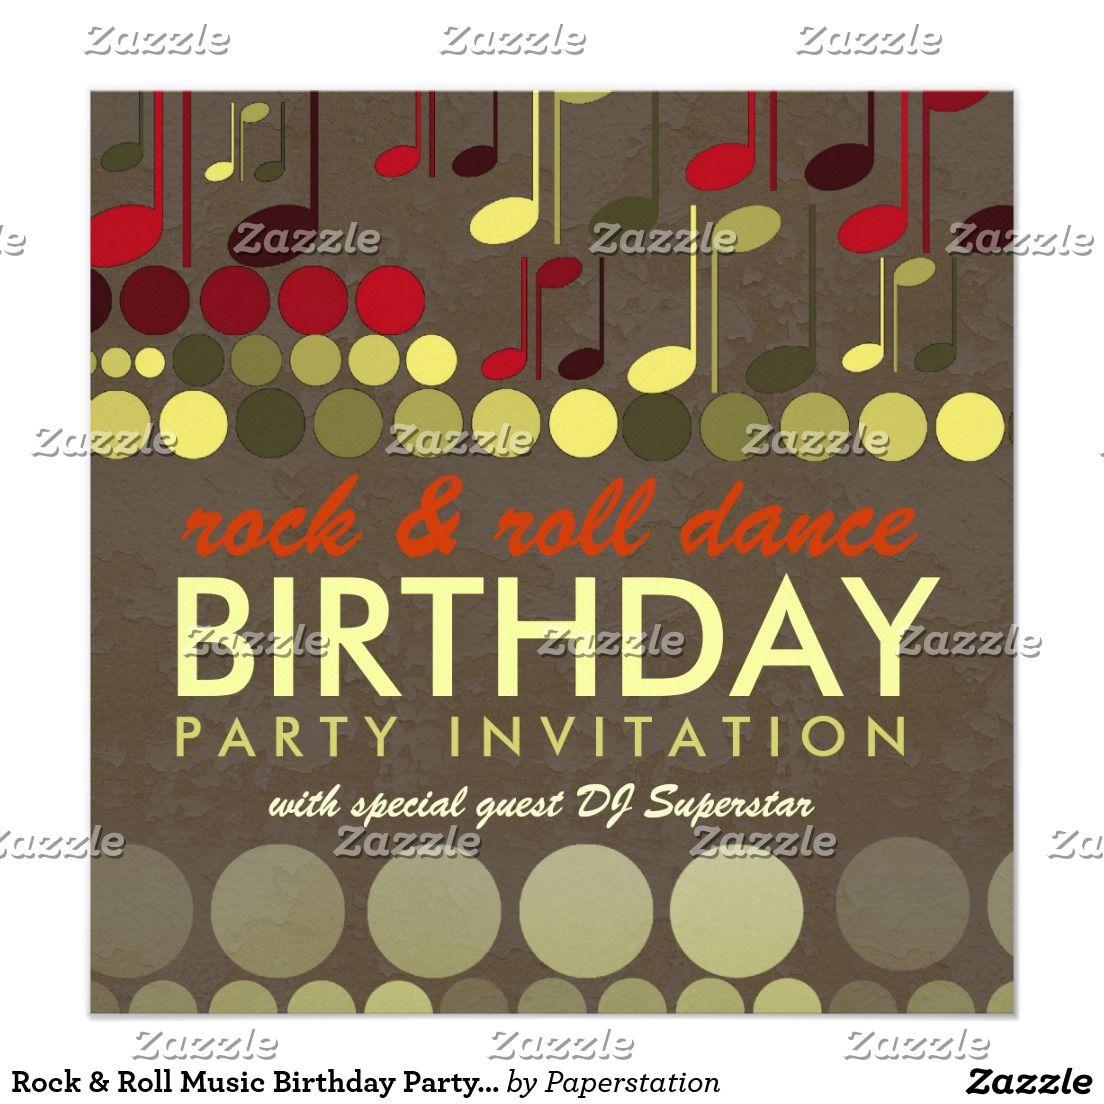 Rock & Roll Music Birthday Party Invitation | 65th Birthday Invites ...